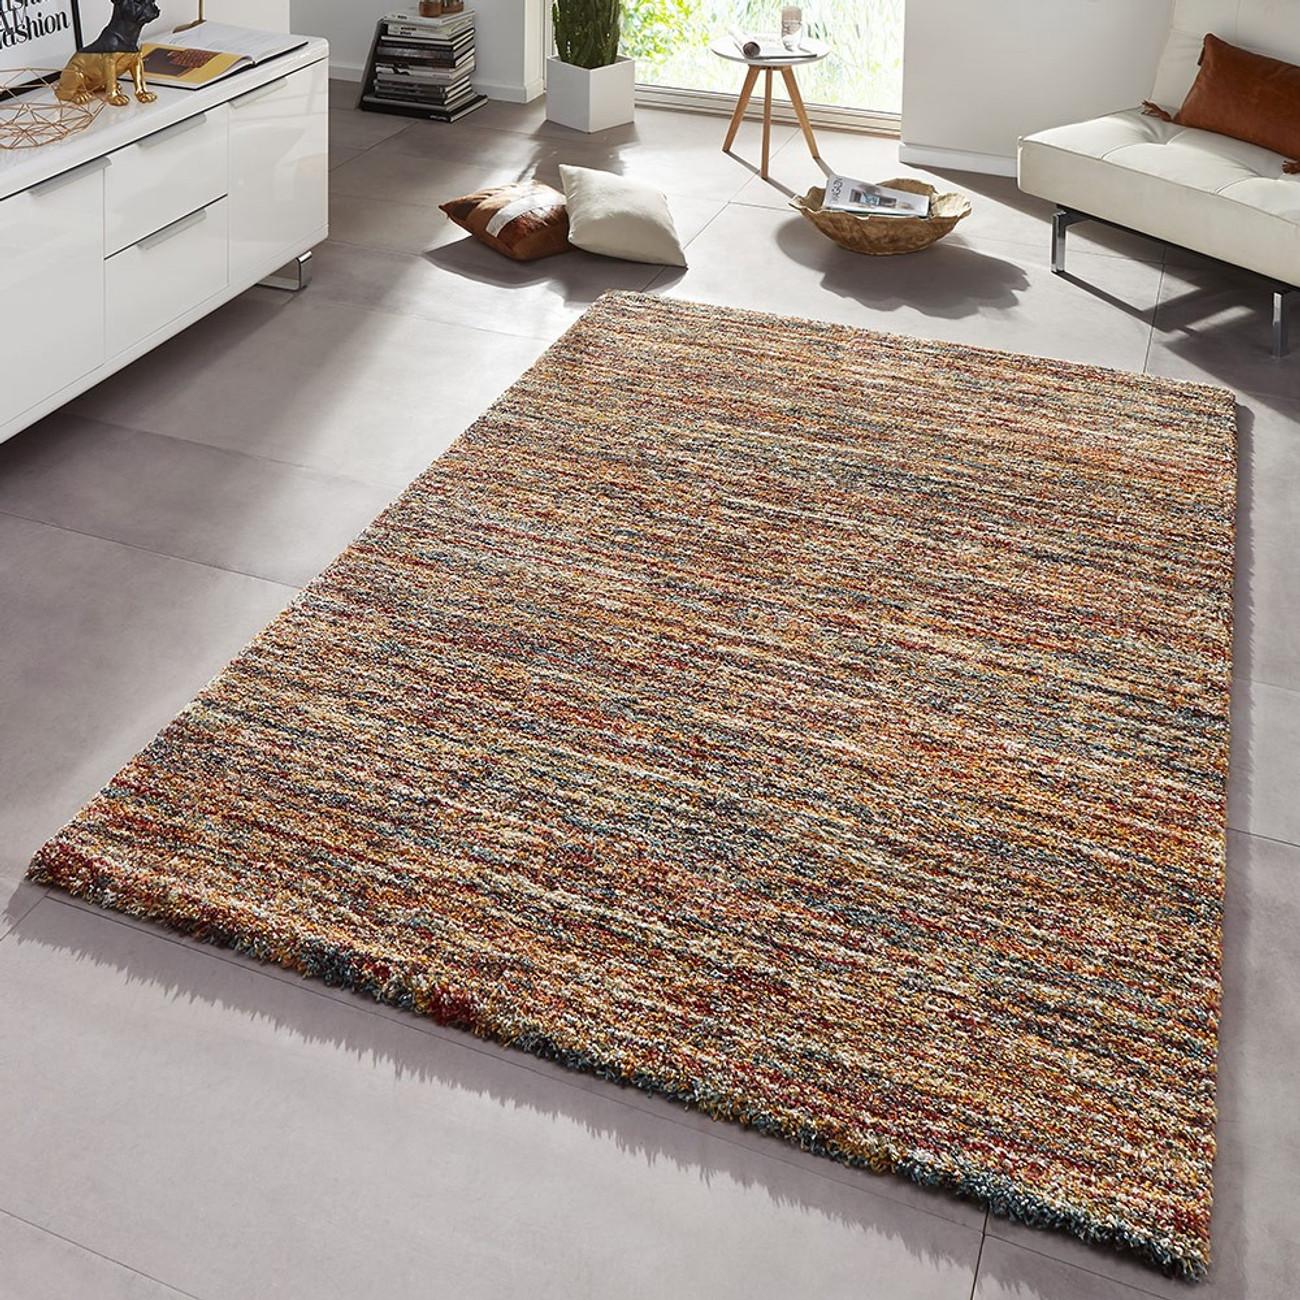 design teppich hochflor langflor gravel rot braun meliert teppiche hochflor teppiche. Black Bedroom Furniture Sets. Home Design Ideas